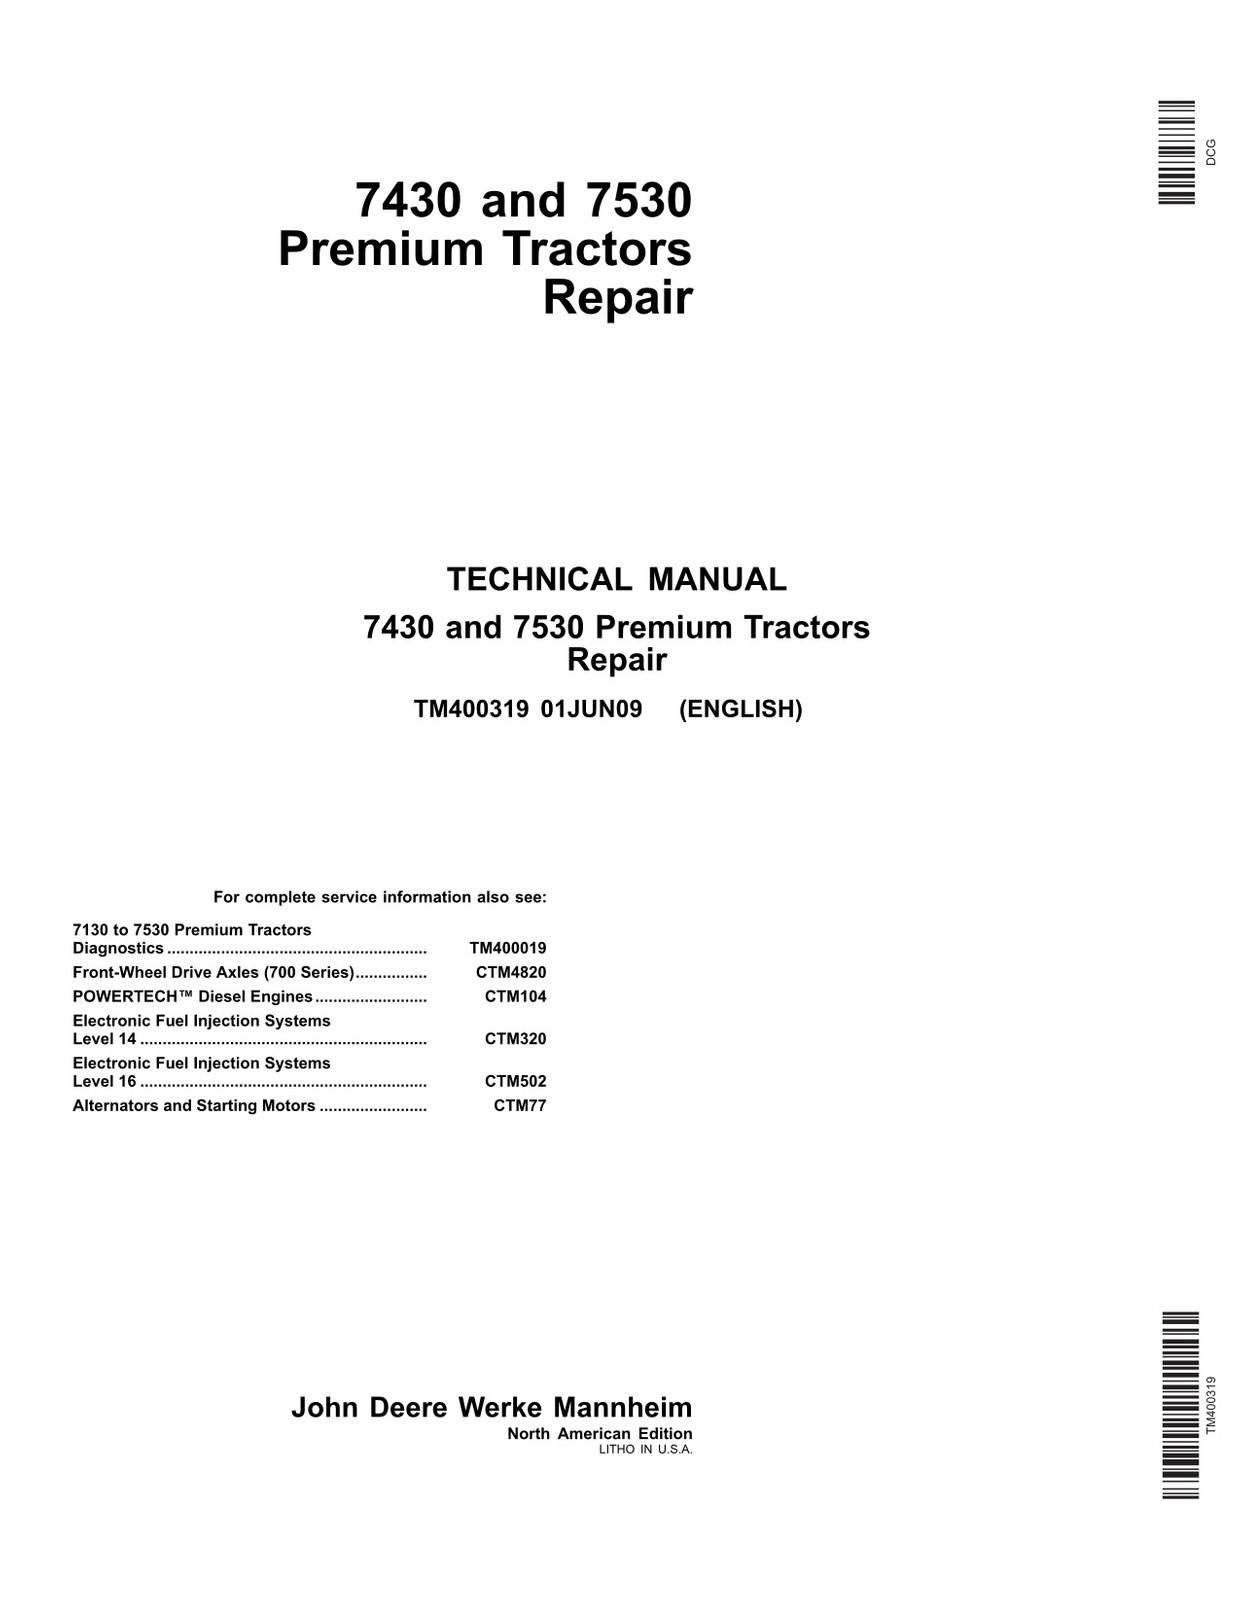 John Deere 7430 7530 Premium tractors - technical manual - TM400319 - 1054  pages - english